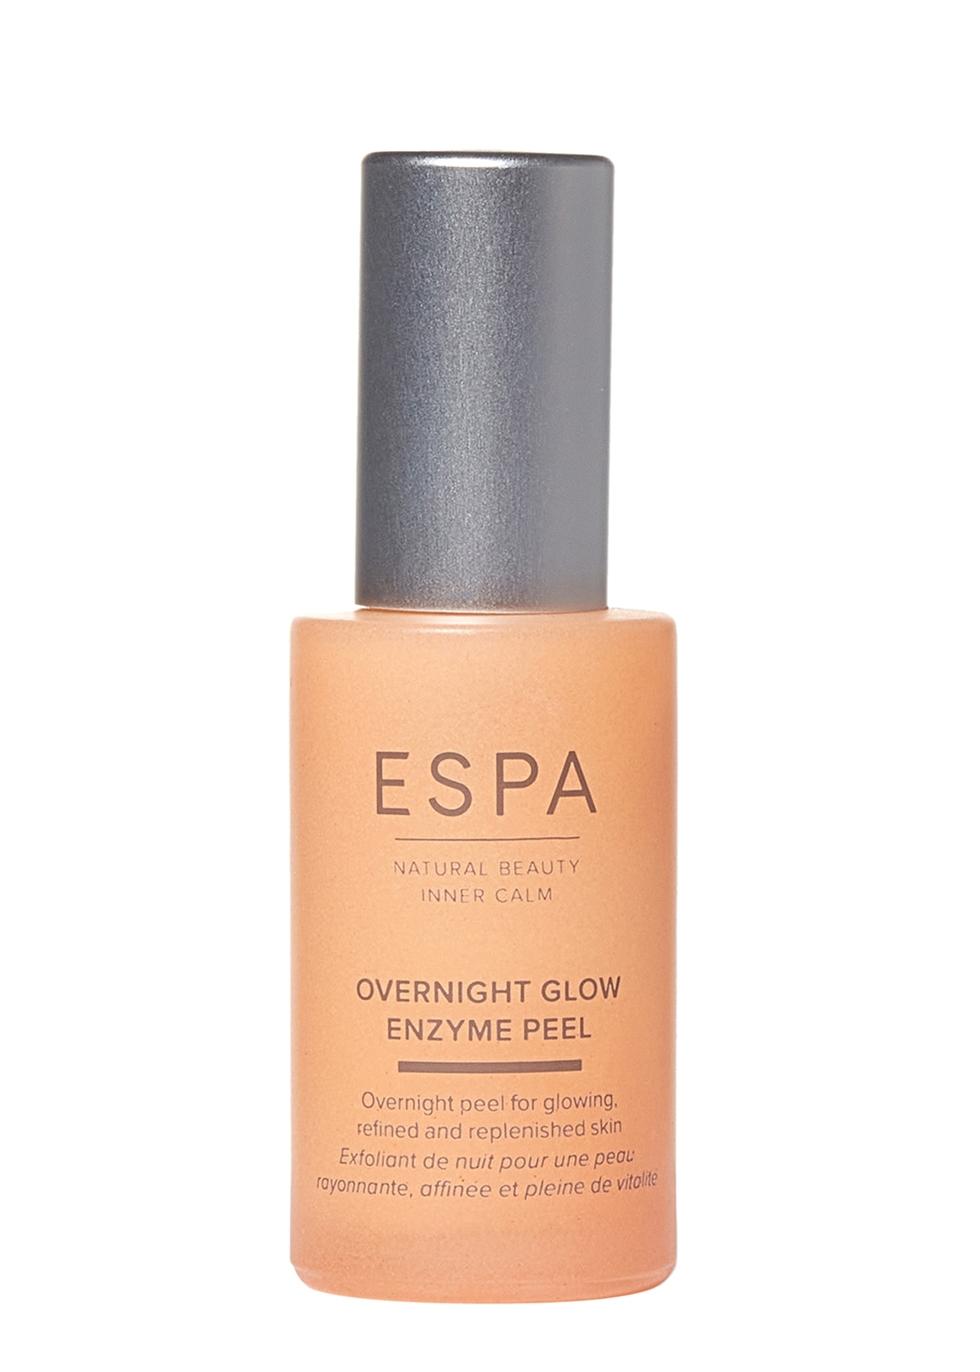 Active Nutrients Overnight Glow Enzyme Peel 30ml